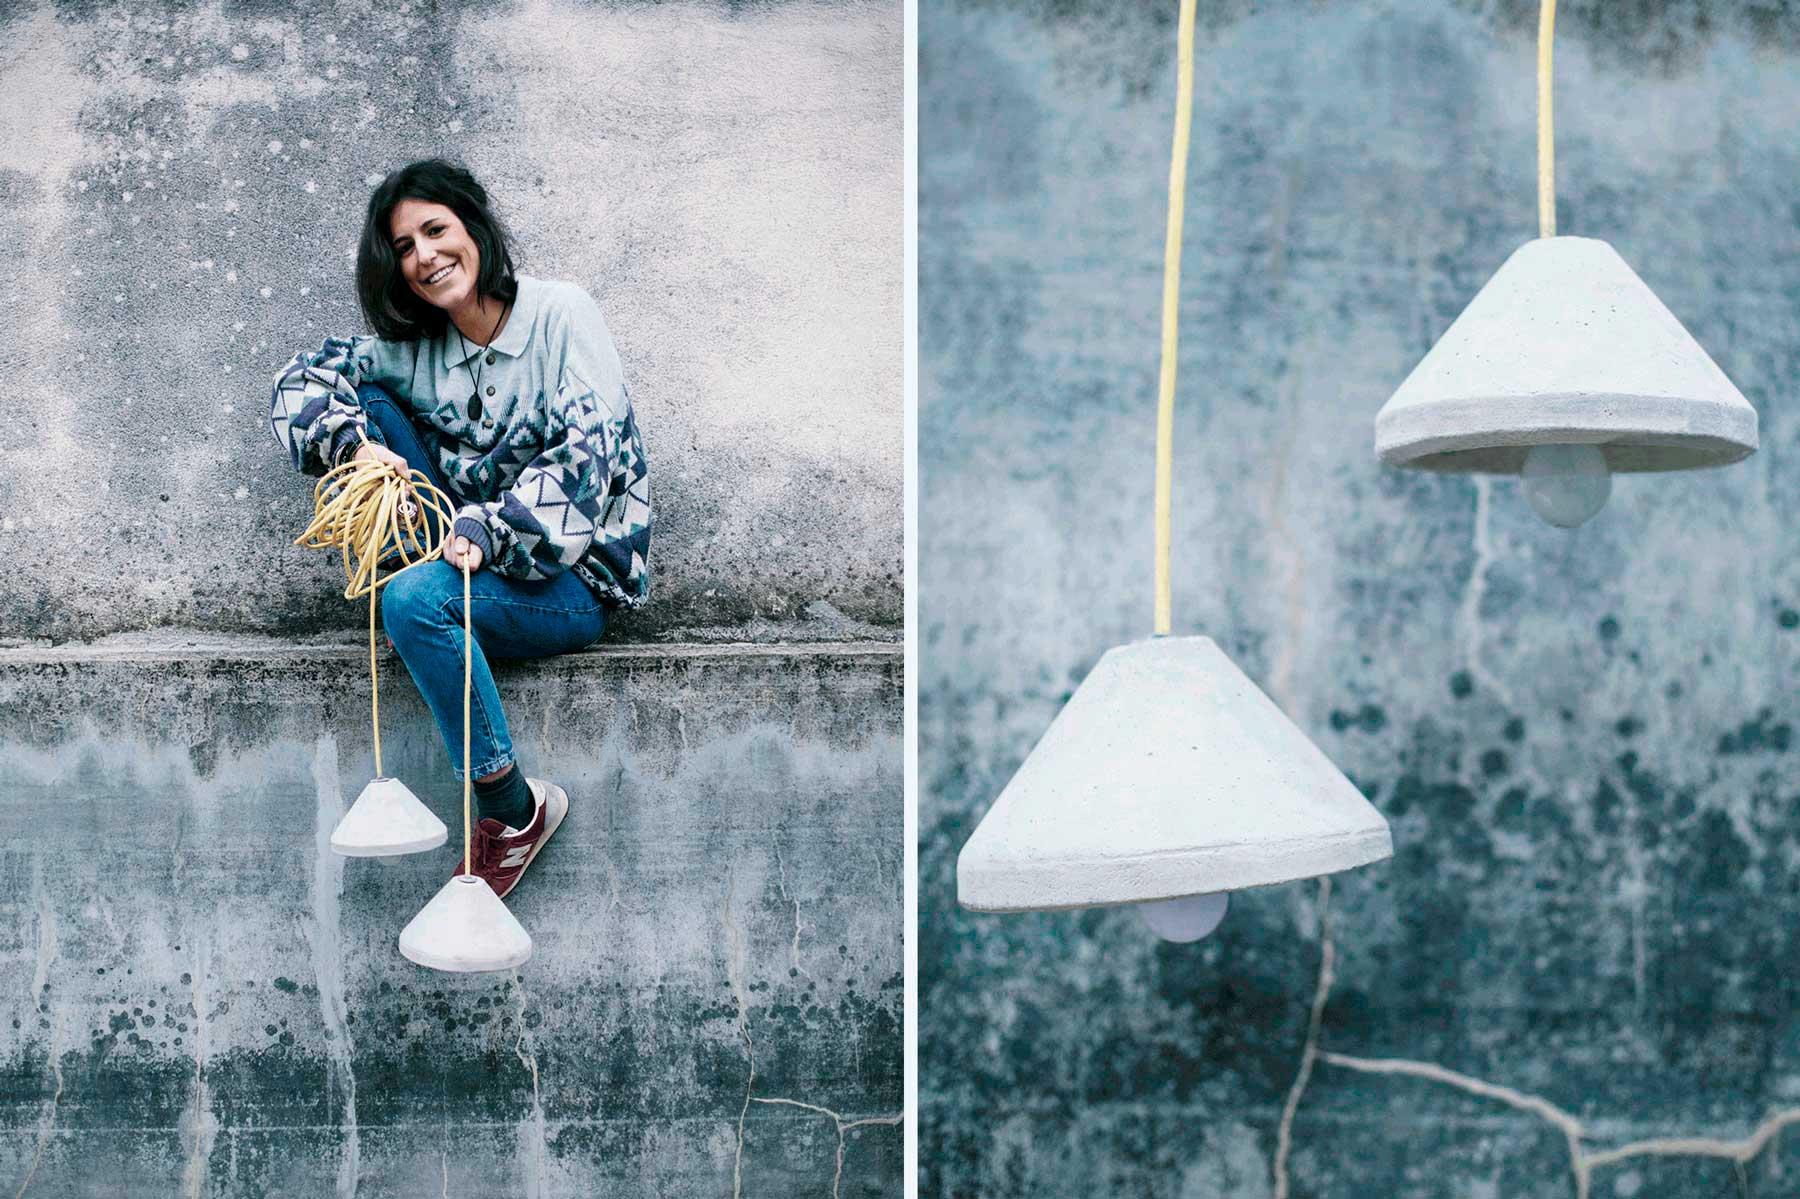 diseño lampara de cenizas doble